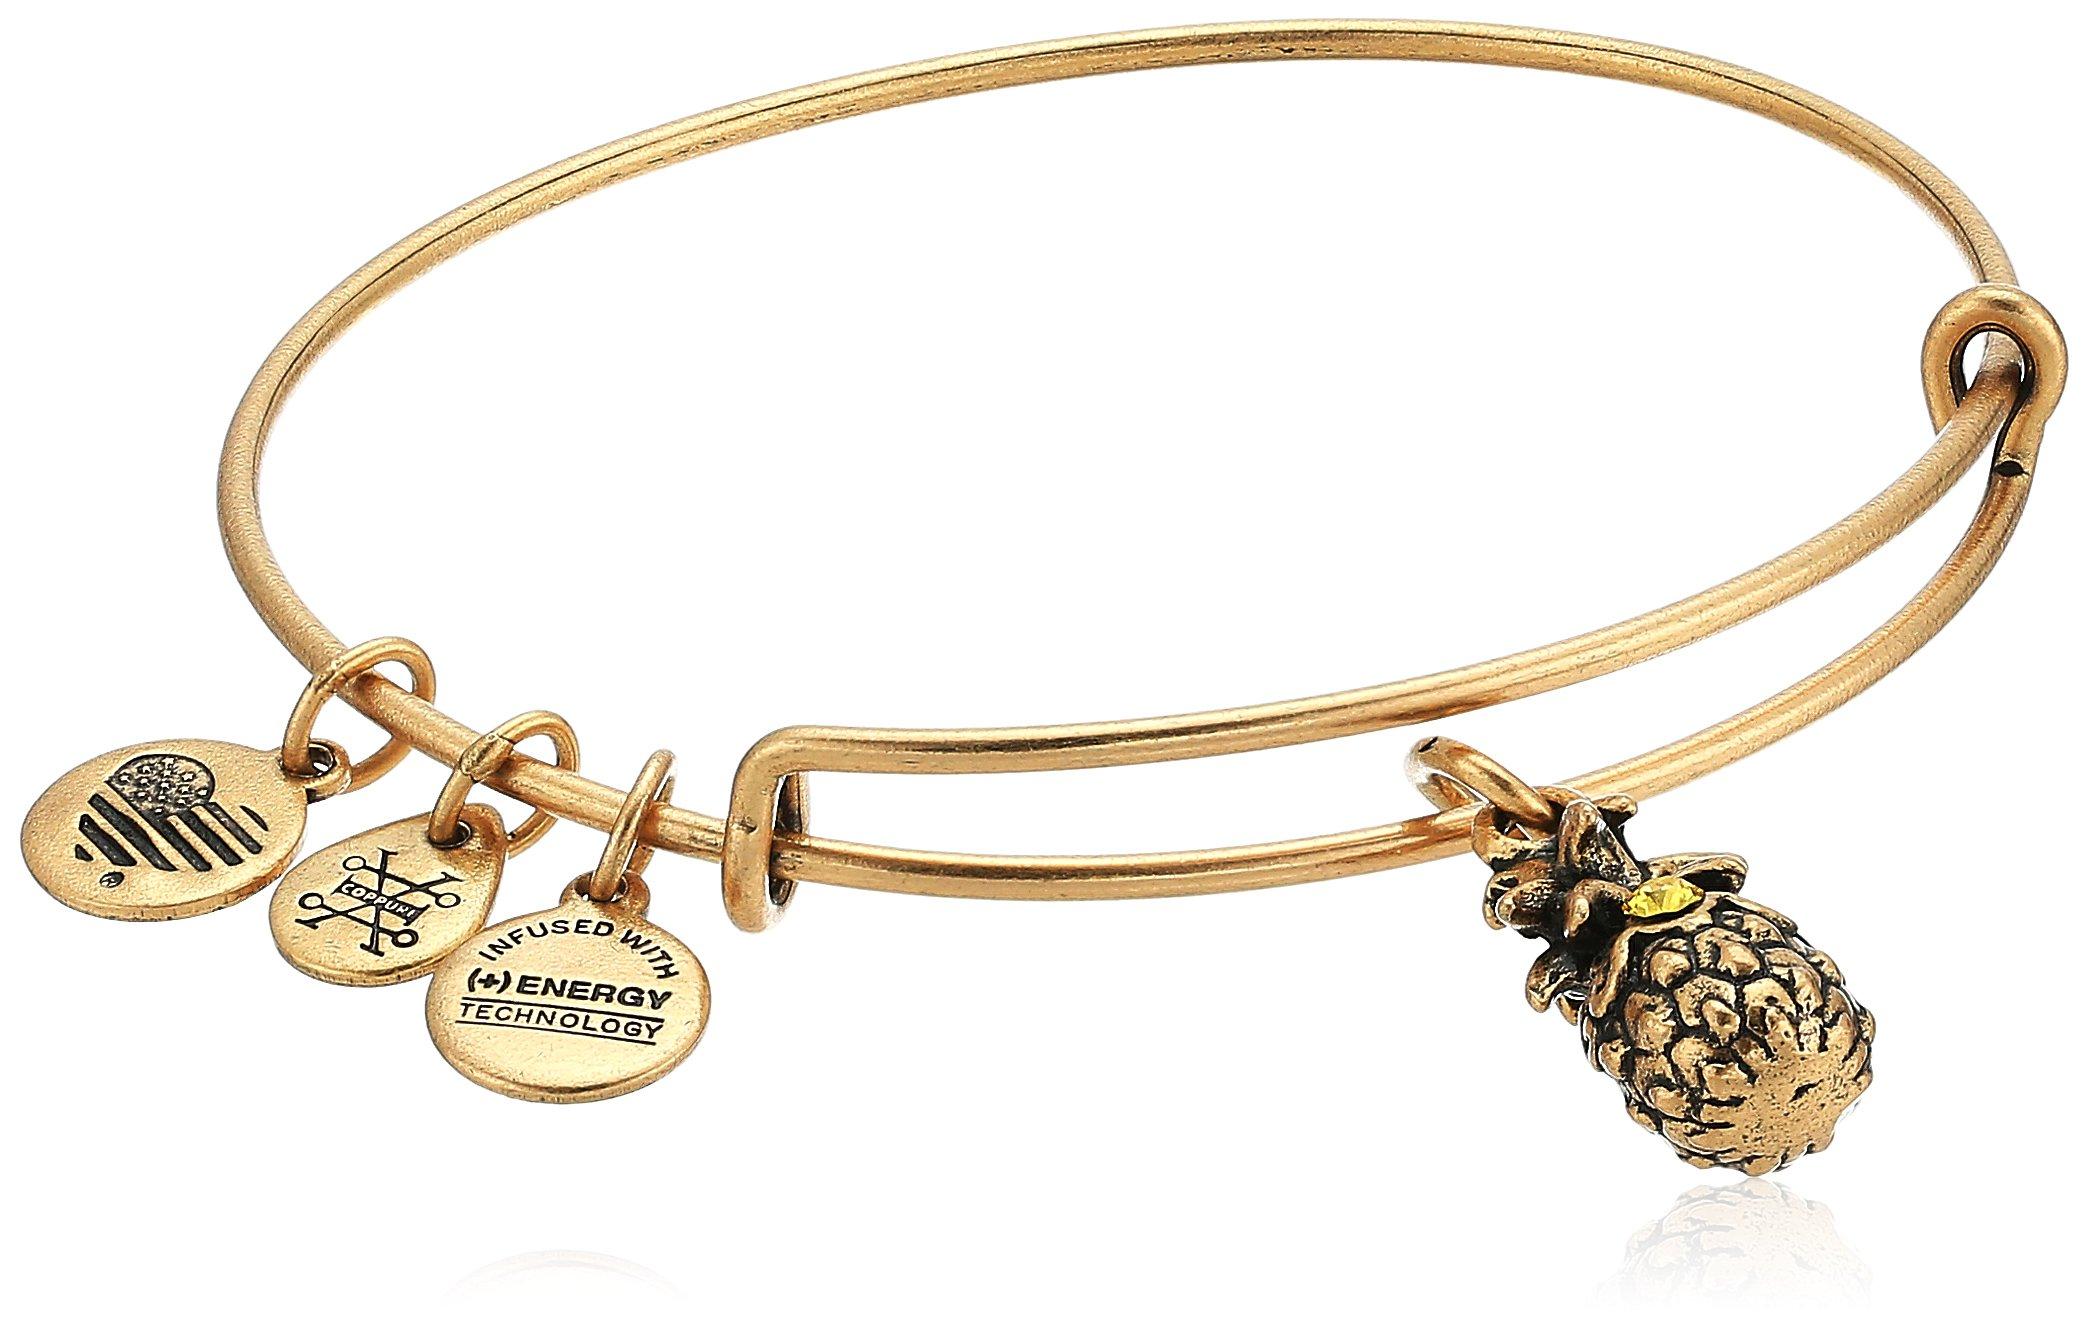 Alex and Ani Pineapple III Bangle Bracelet, Rafealian Gold, Expandable